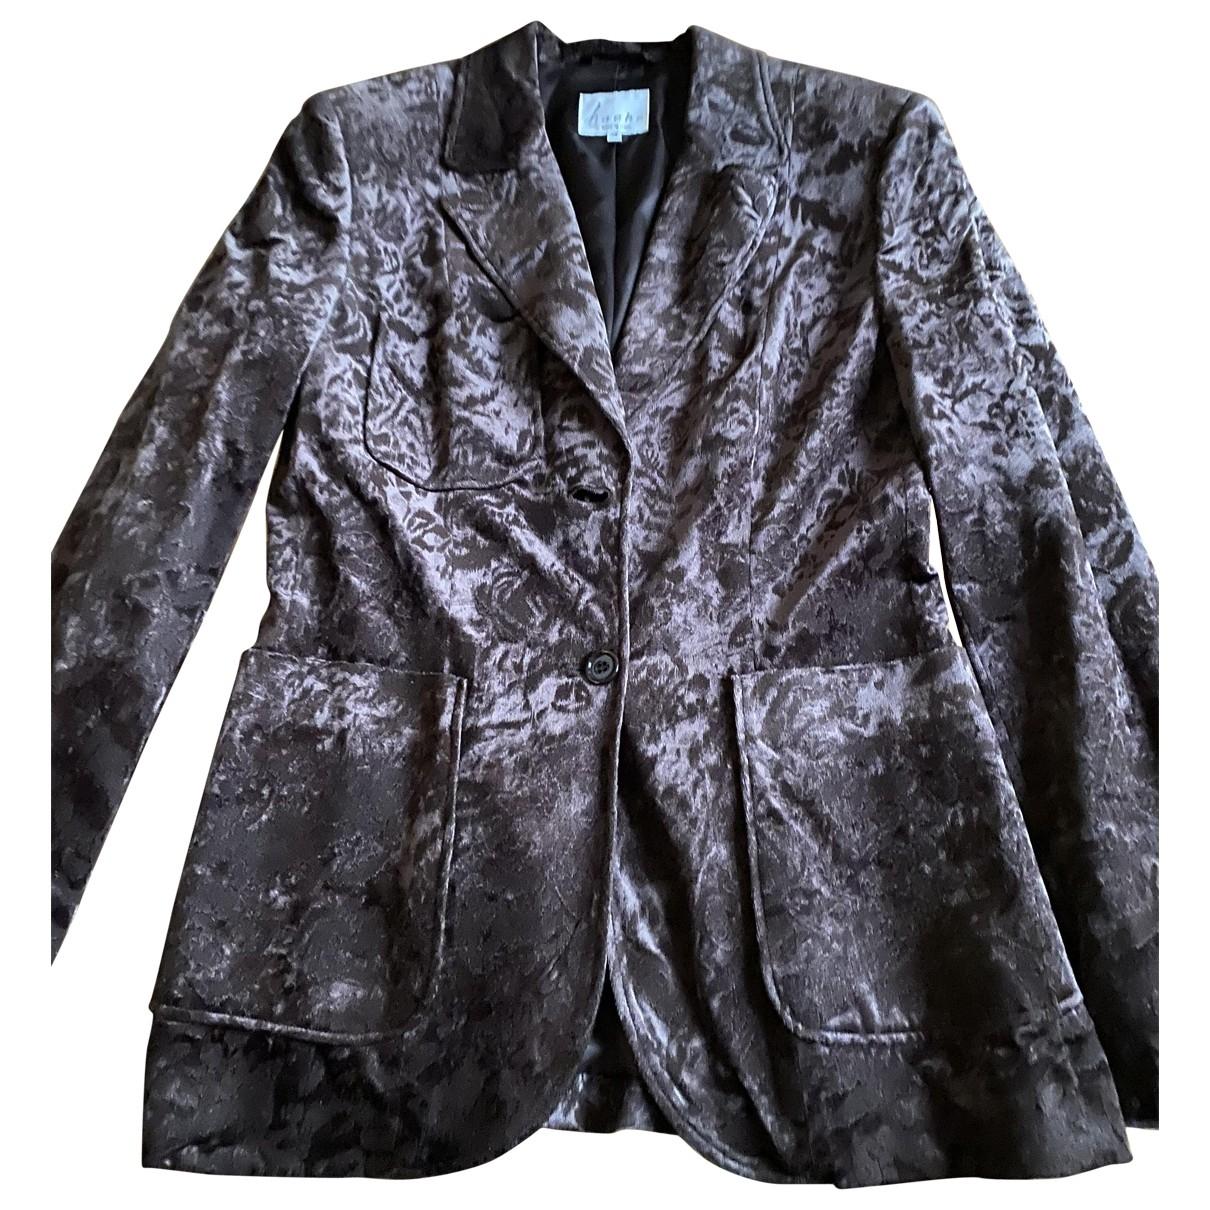 Hache \N Brown jacket for Women 42 IT